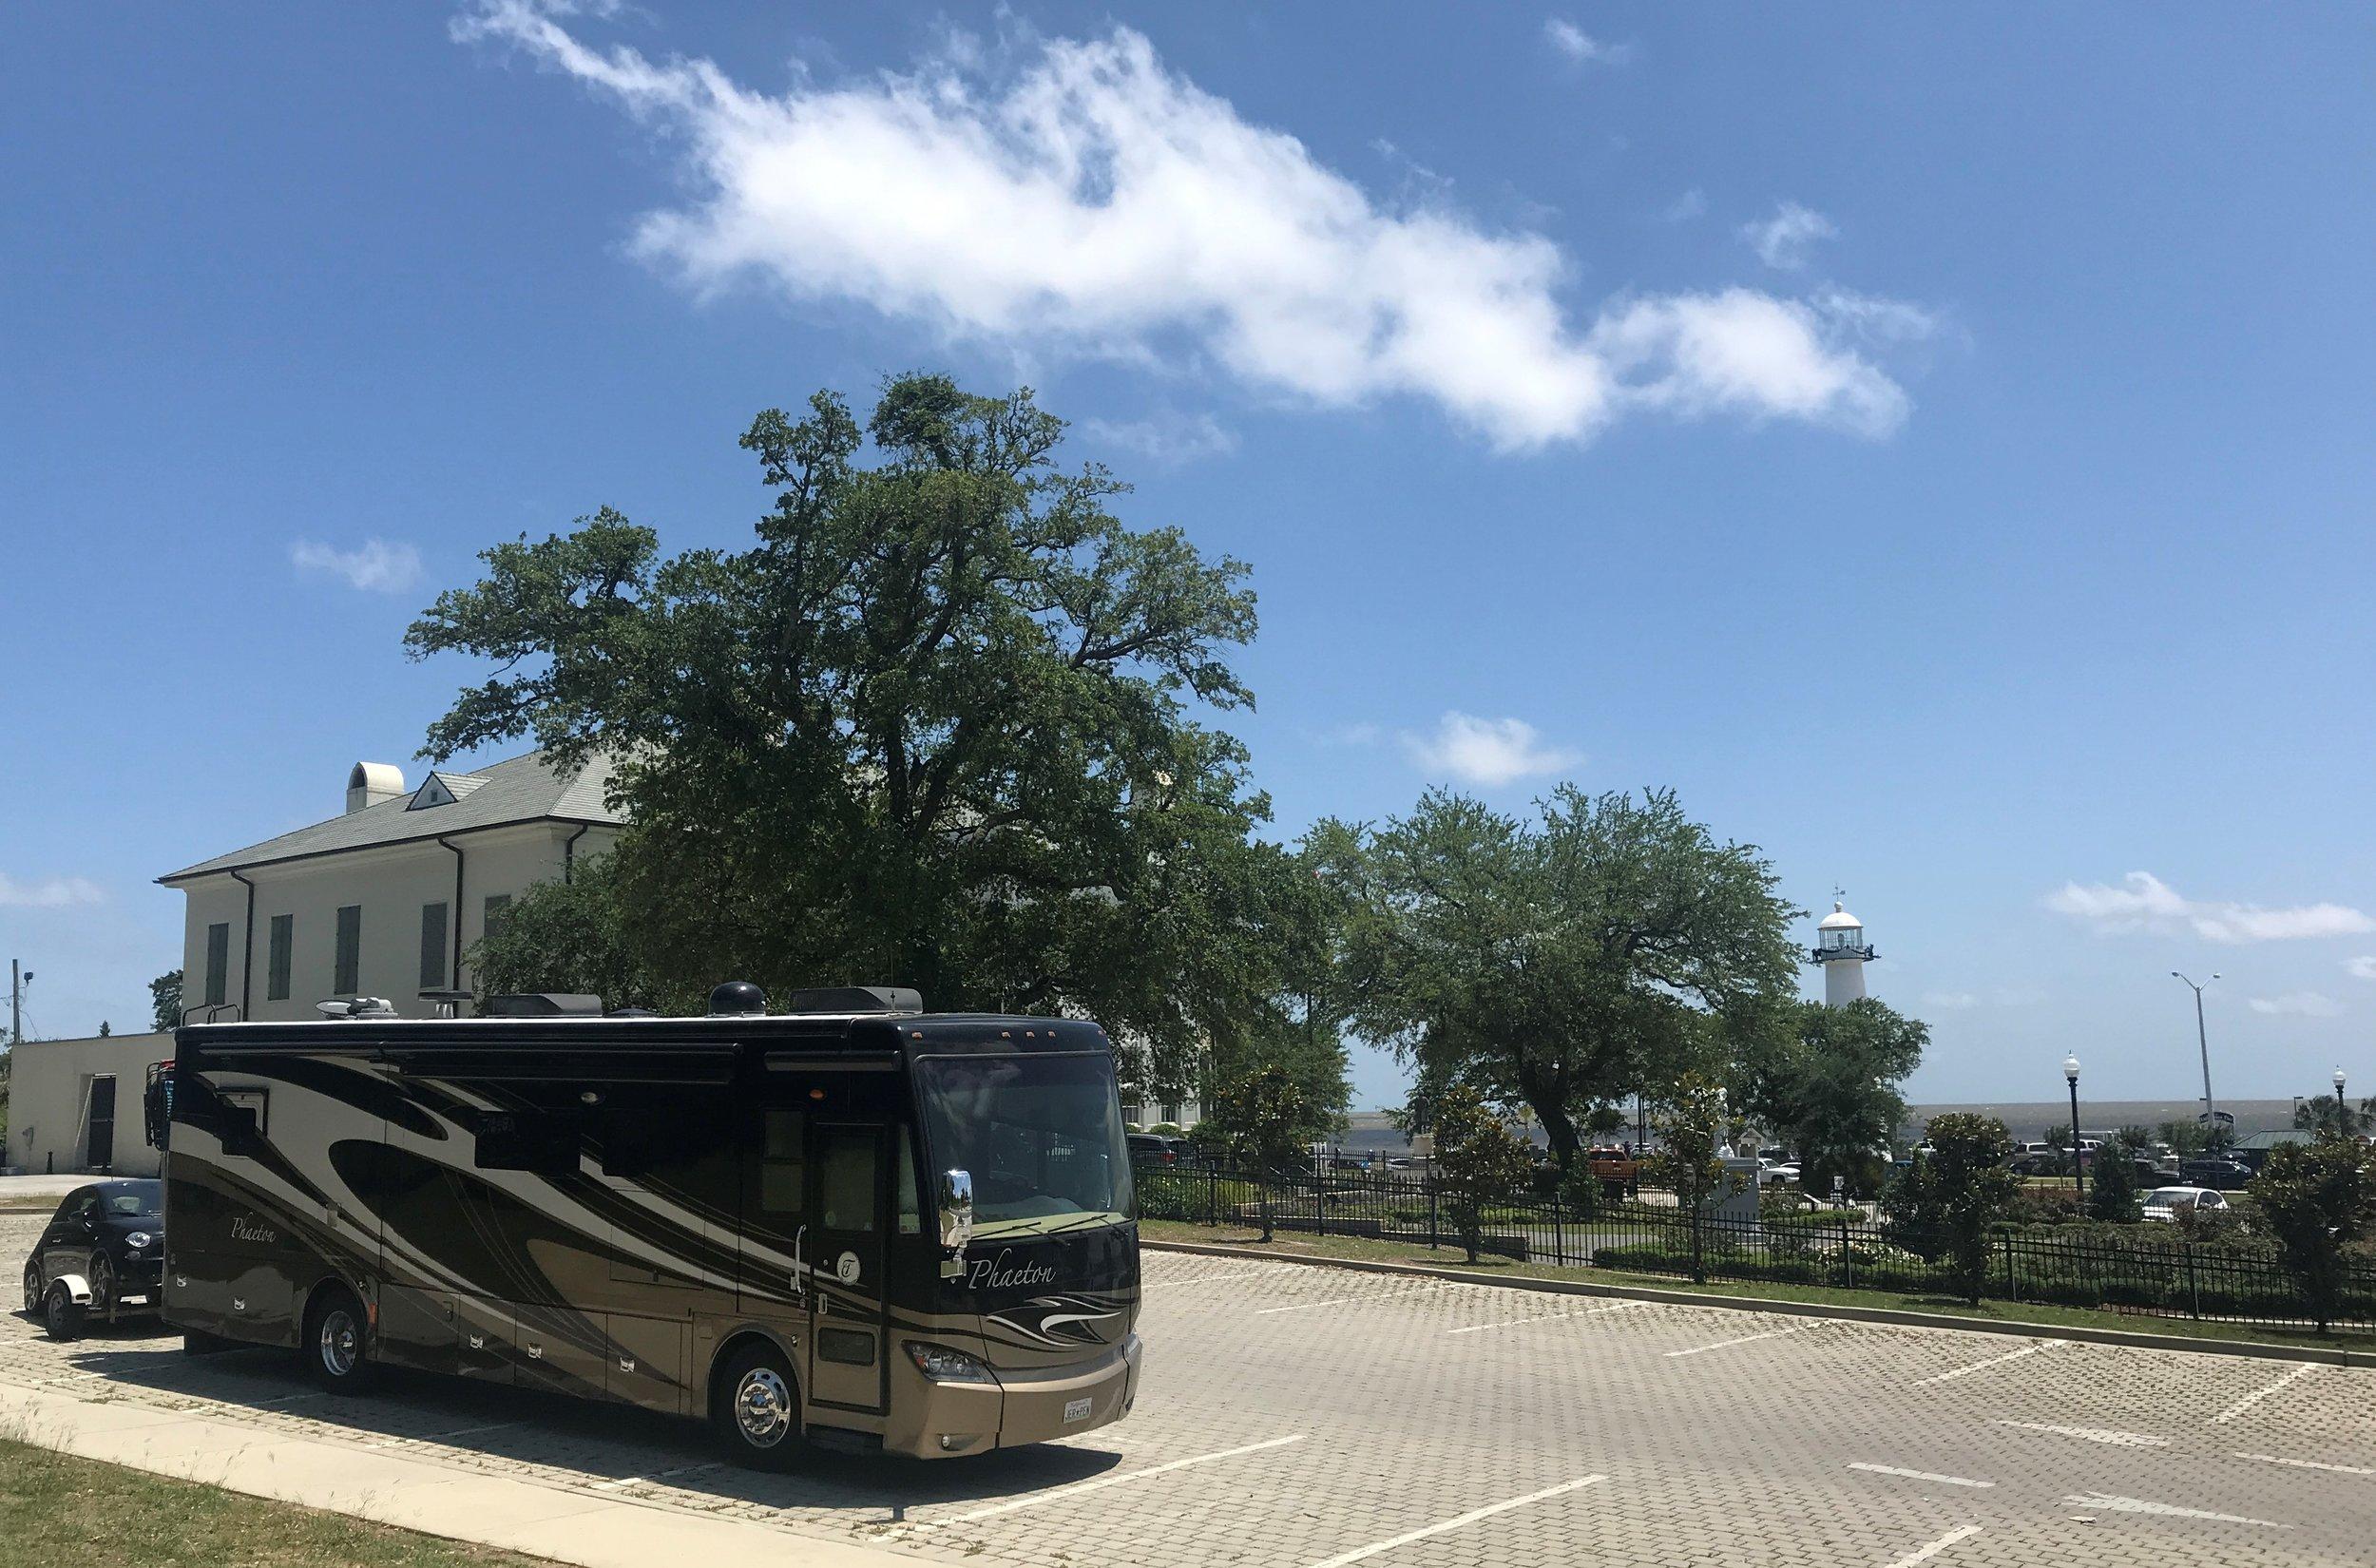 The Biloxi Visitor Center, Lighthouse and beach